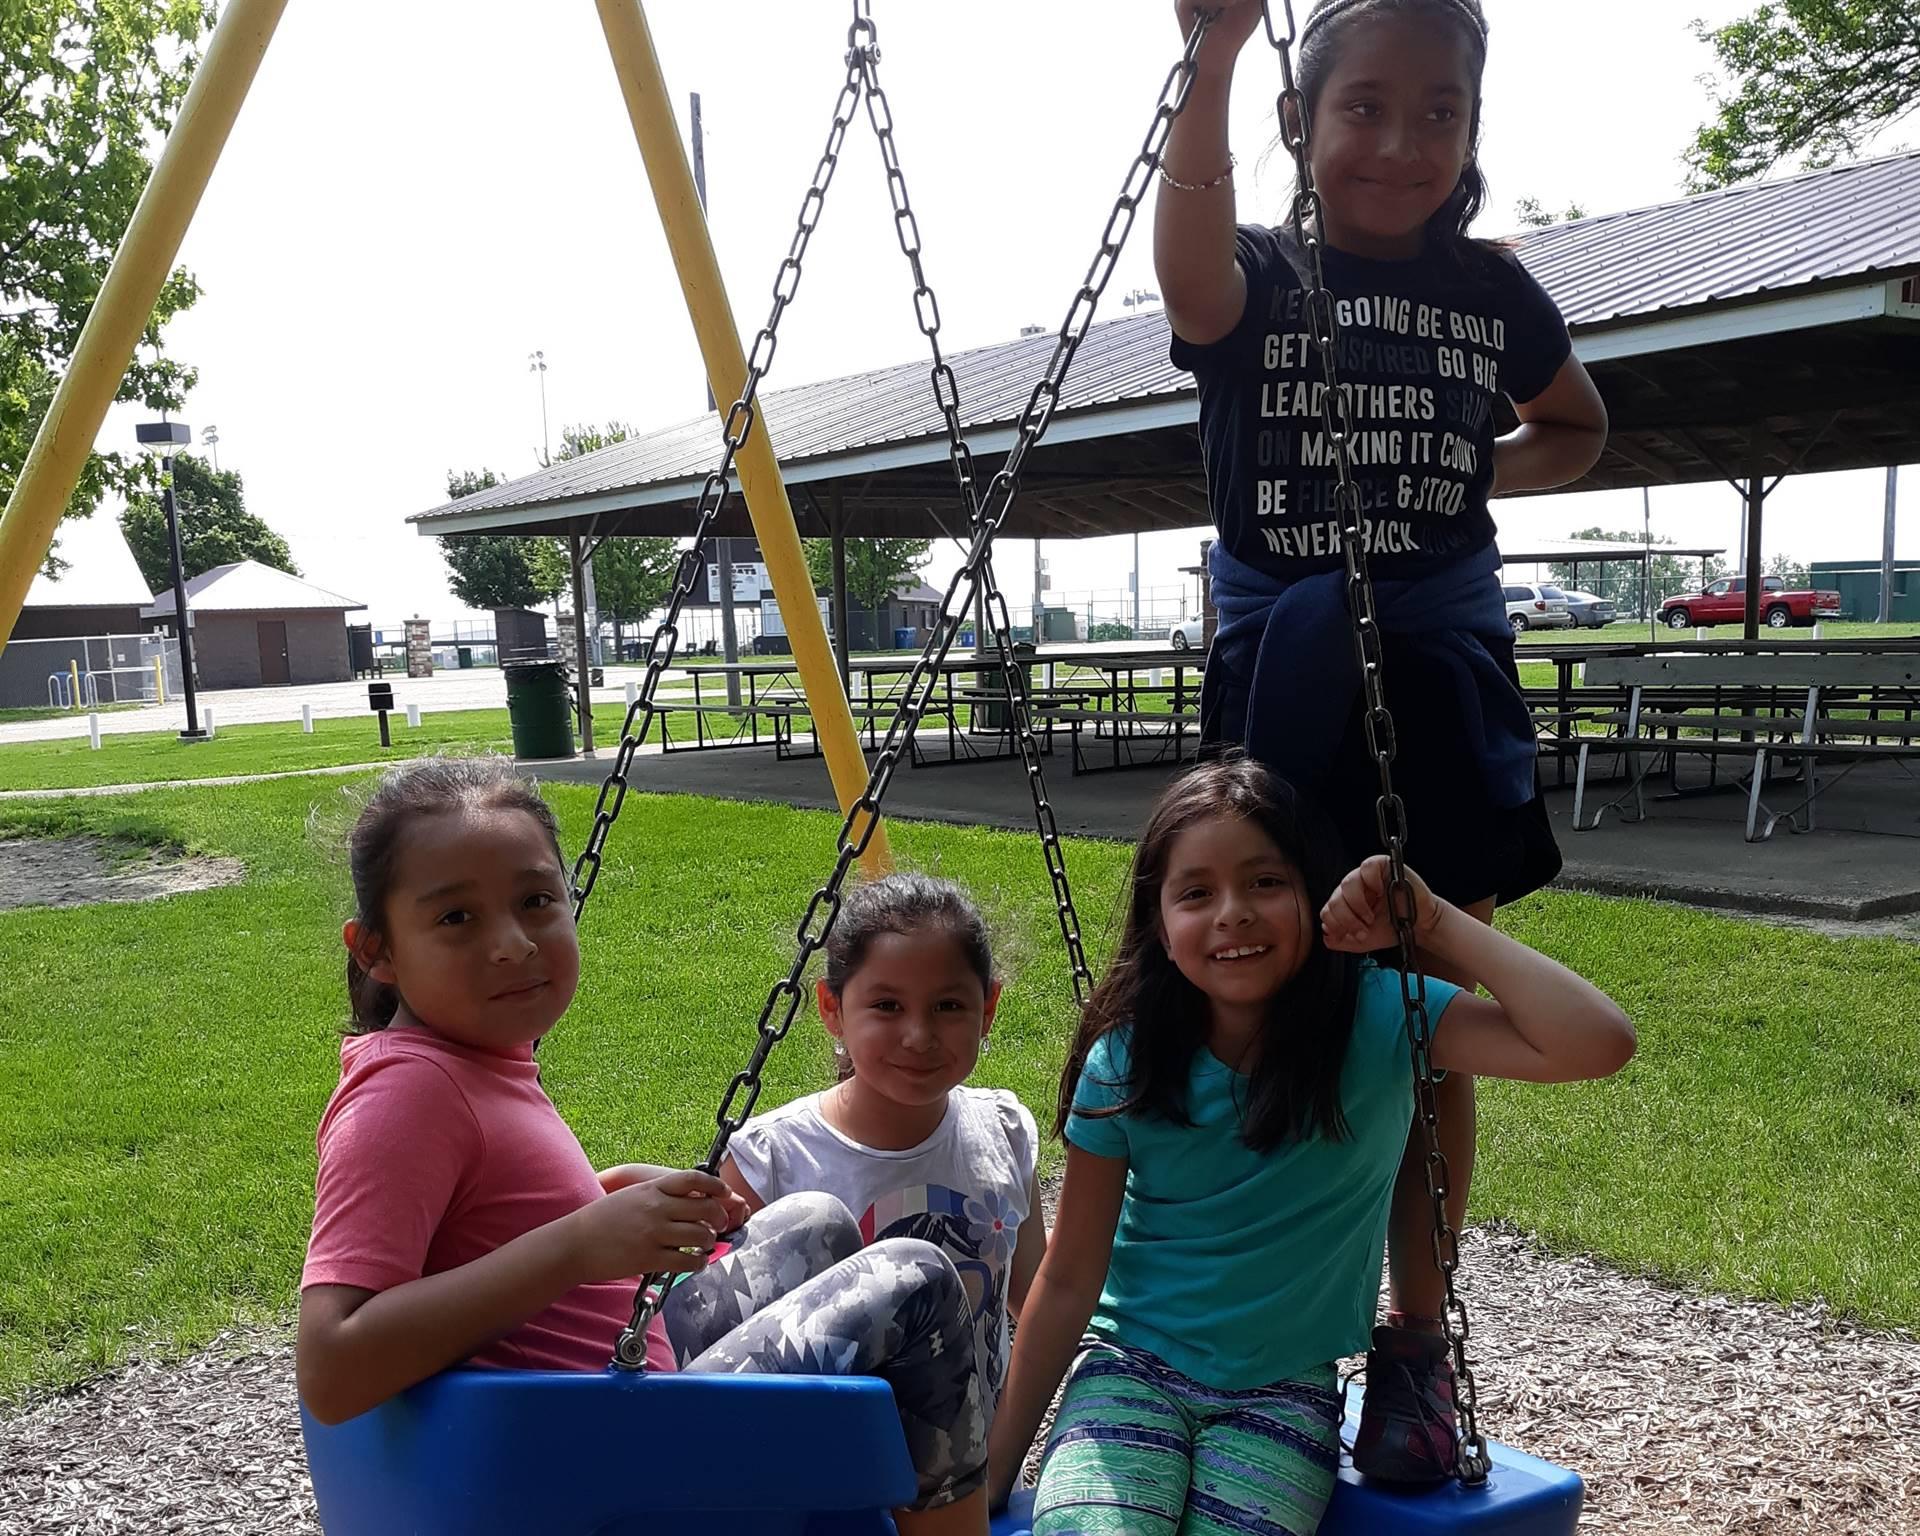 Students having fun on the playground